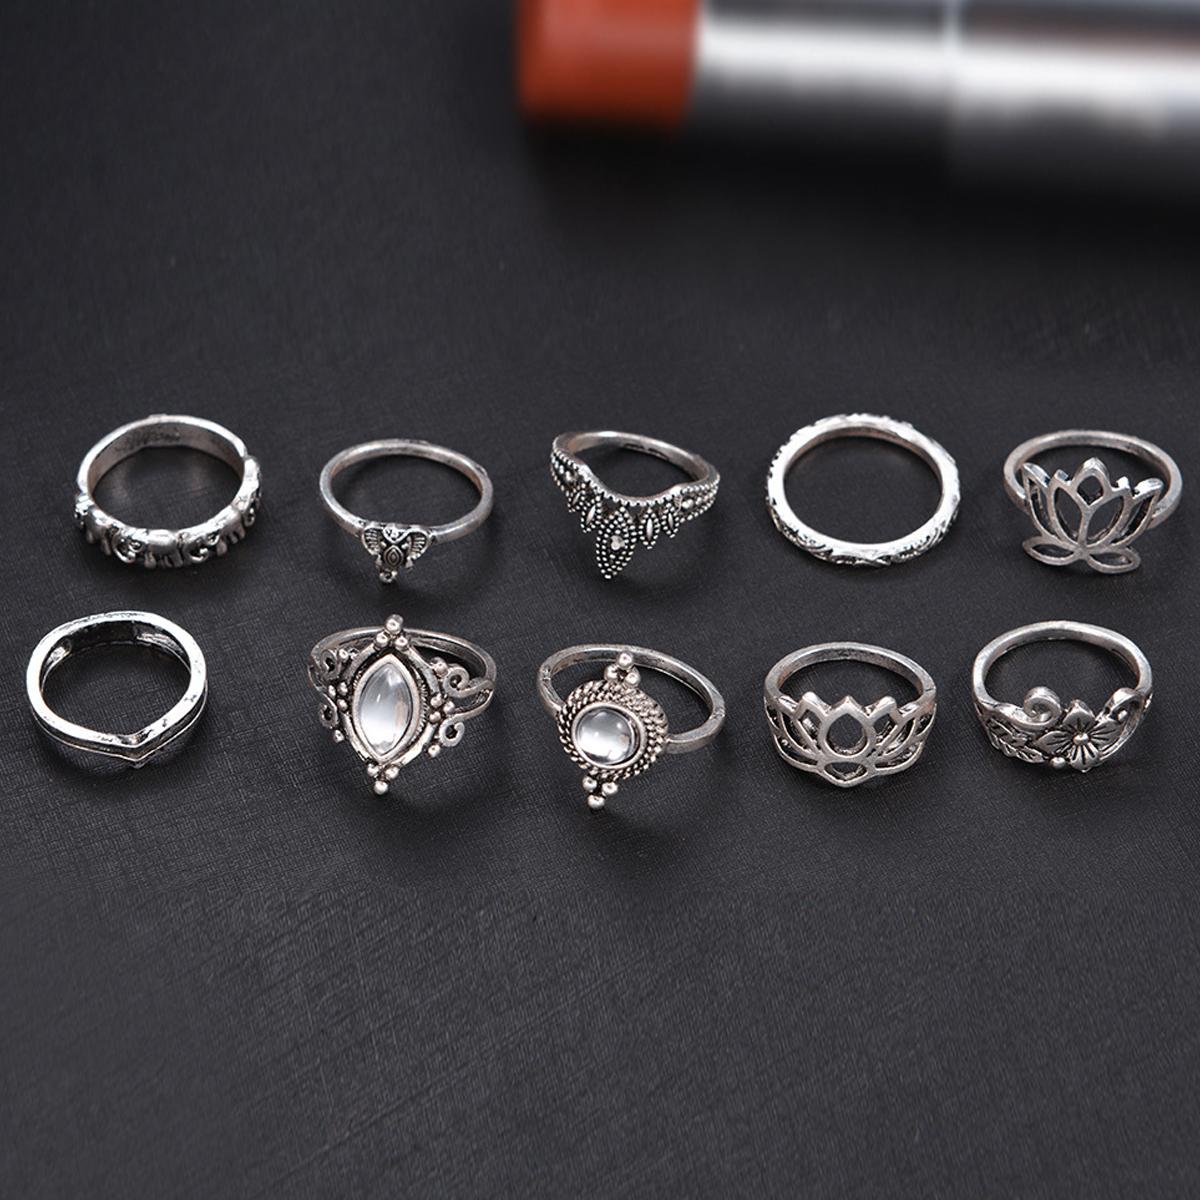 Good Quality 10pcs/Set Vintage Bohemian Ring Set (Less than 1$ each)